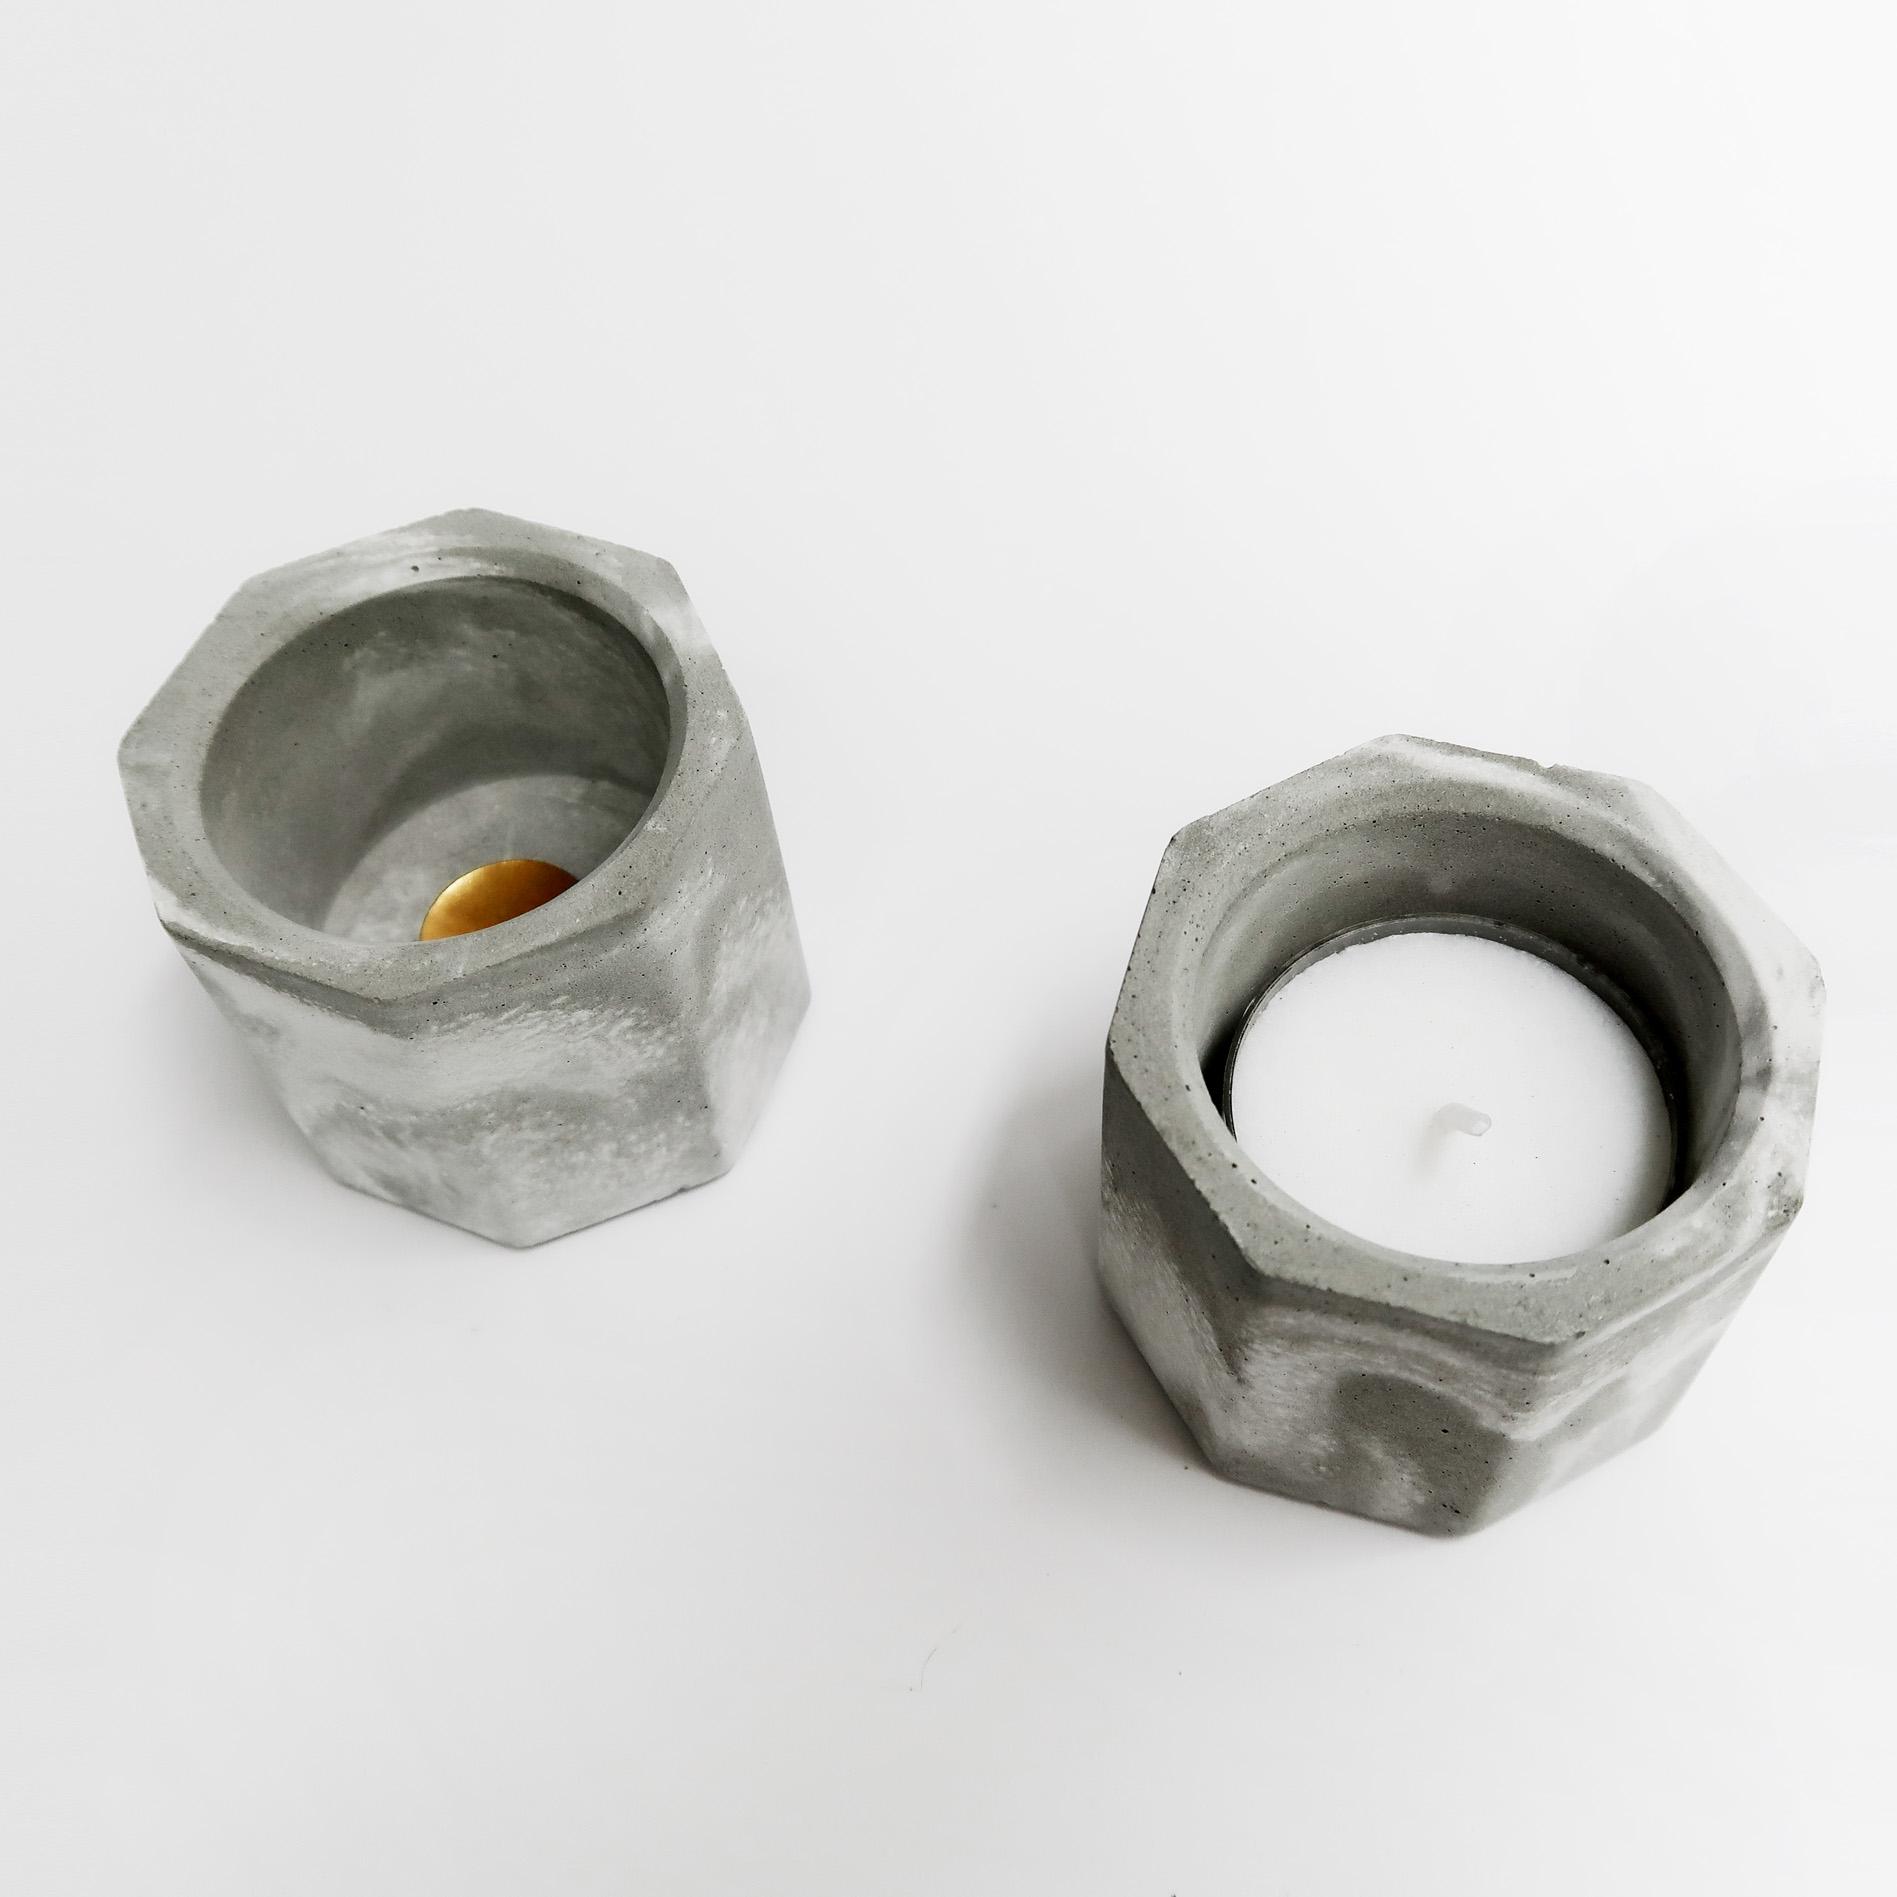 CARRARA 卡拉拉大理石紋水泥設計家飾・擺飾・禮物